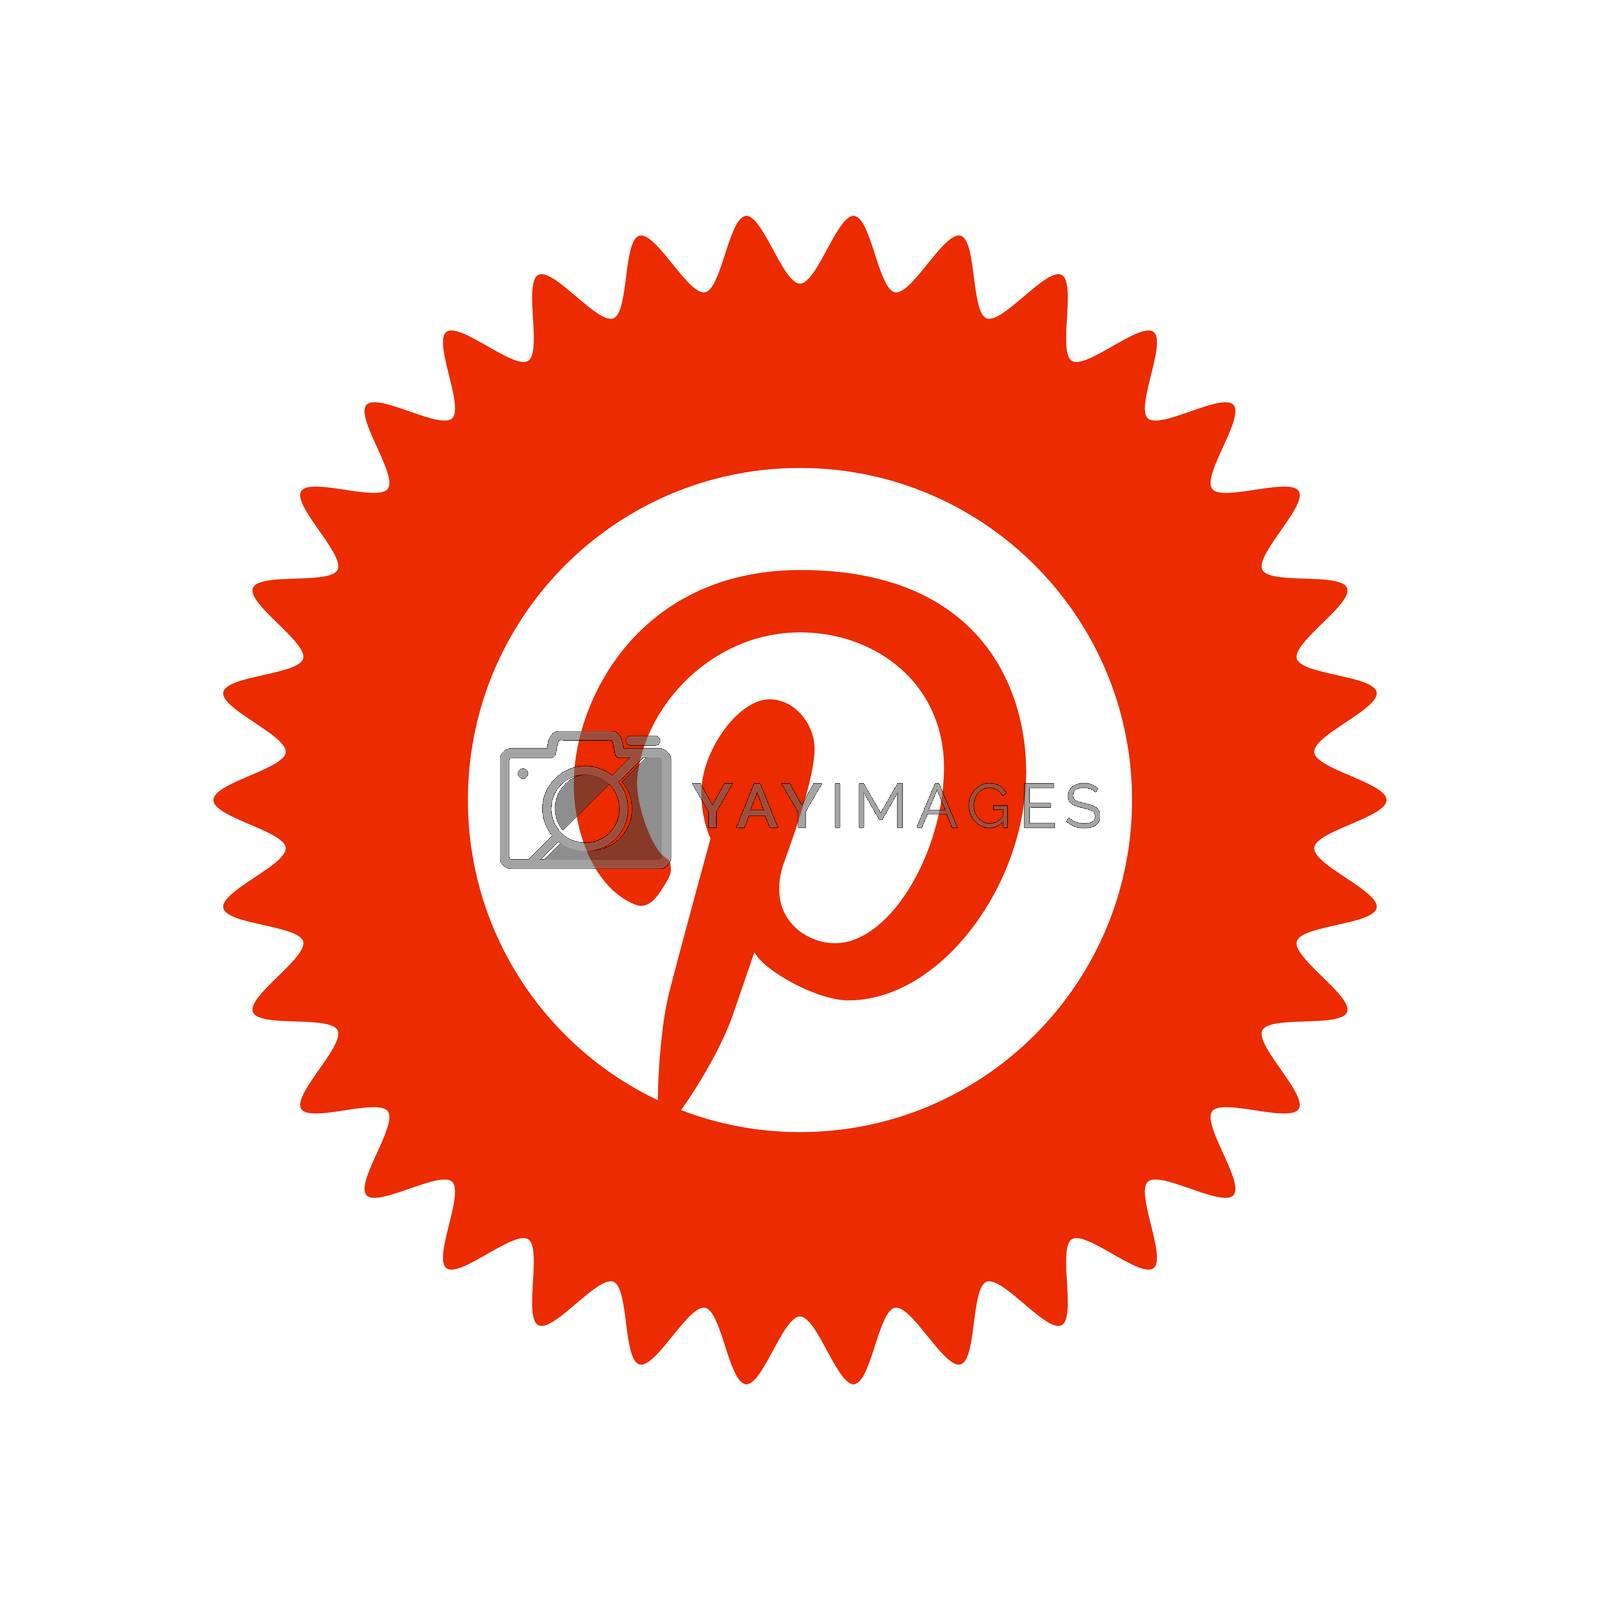 Pinterest logo. Pinterest is a web and mobile application that operates a photo sharing website. Pinterest app . Kharkiv, Ukraine - June, 2020